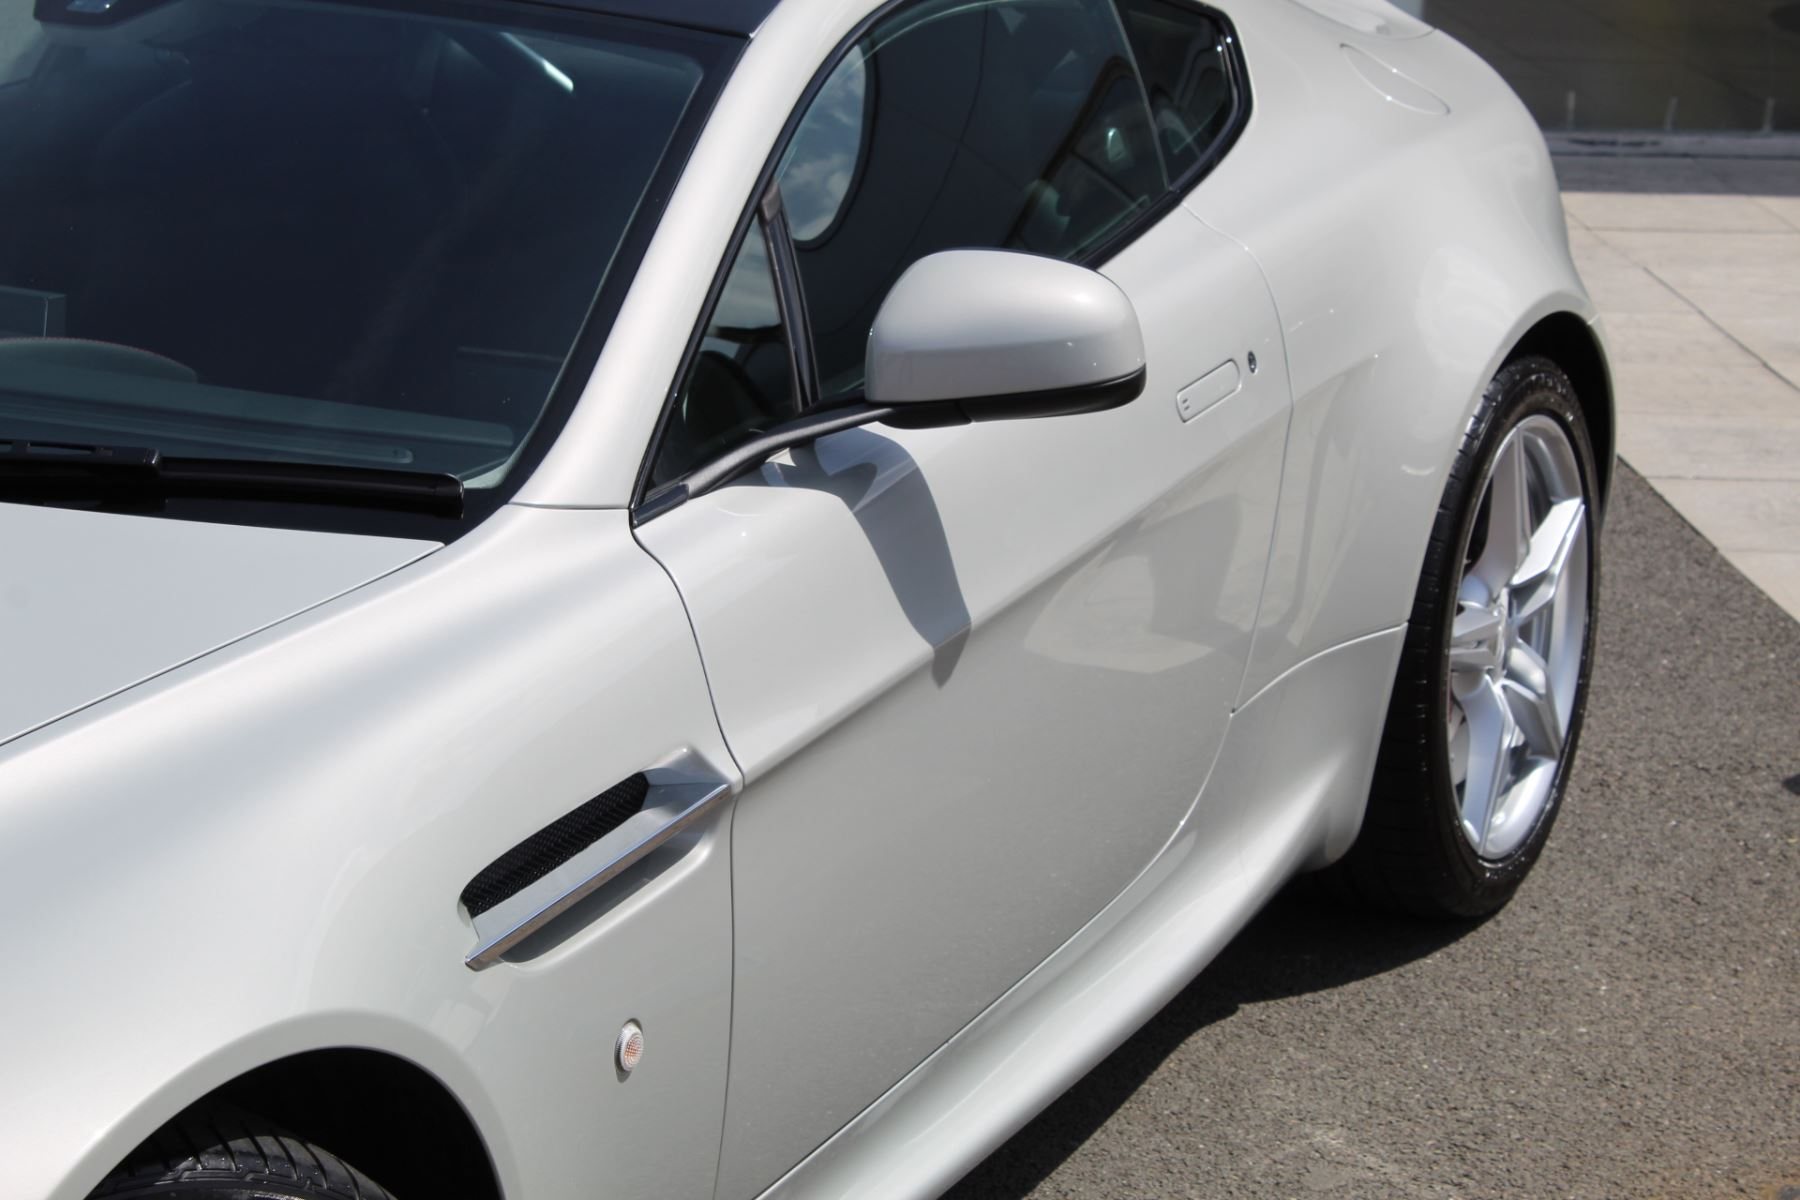 Aston Martin V8 Vantage Coupe 2dr [420] Latest Dash, 420BHP image 17